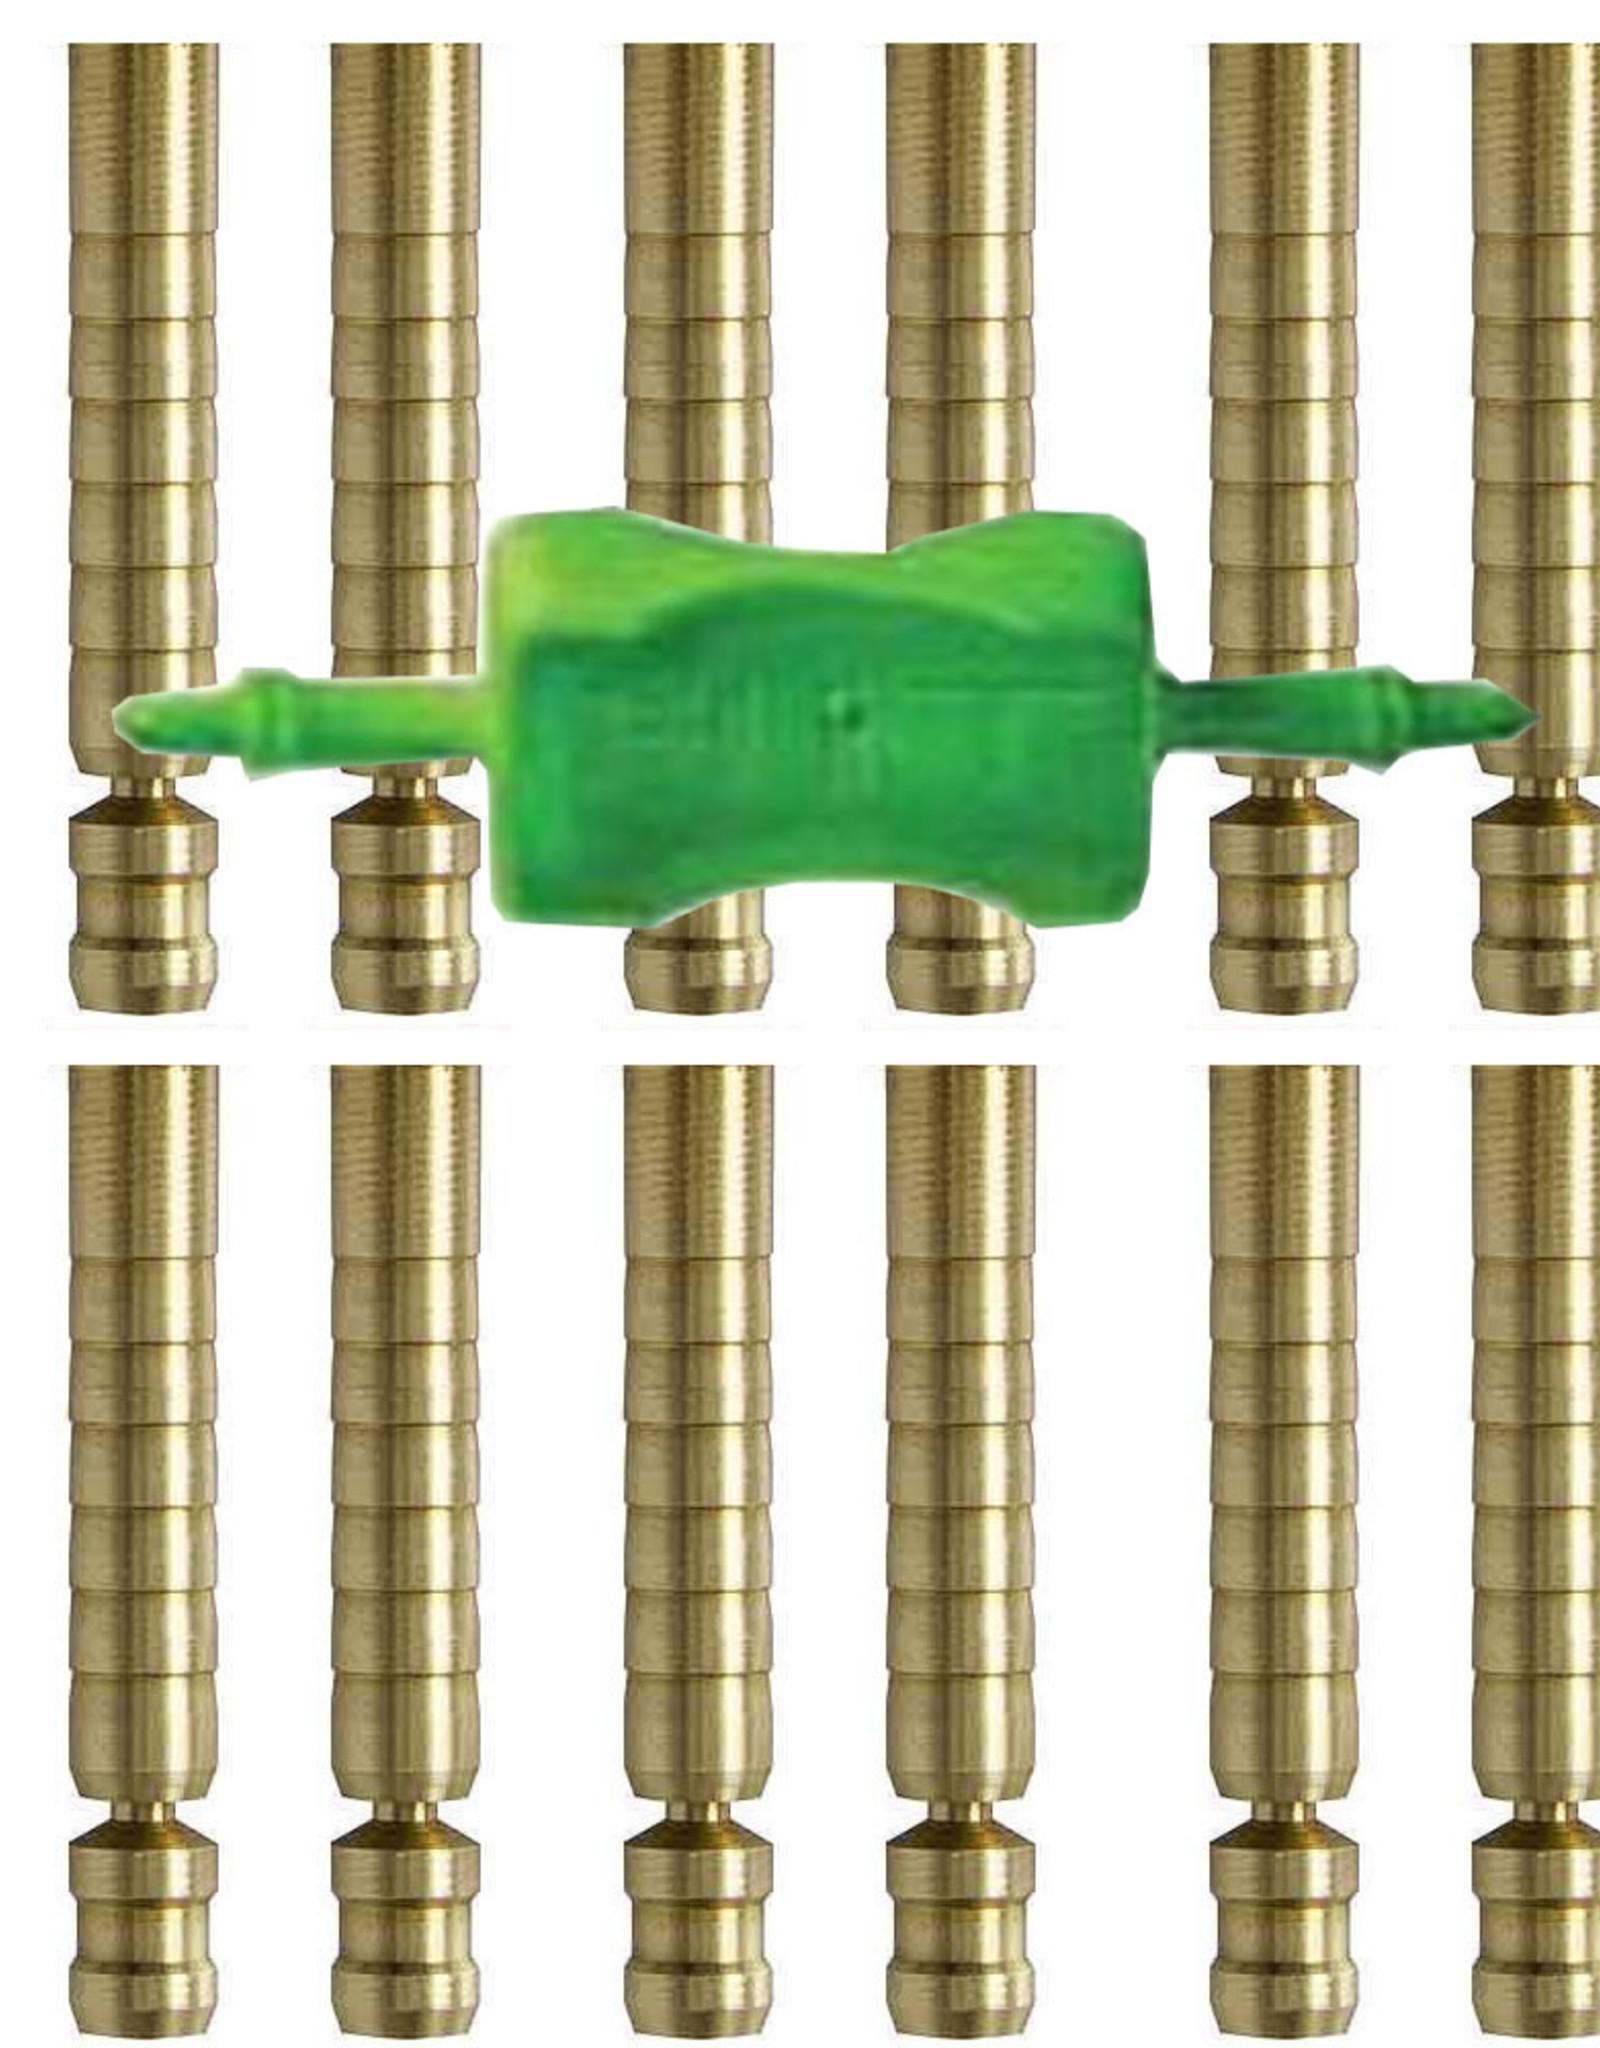 Easton 5mm Brass Inserts 50-75 gr